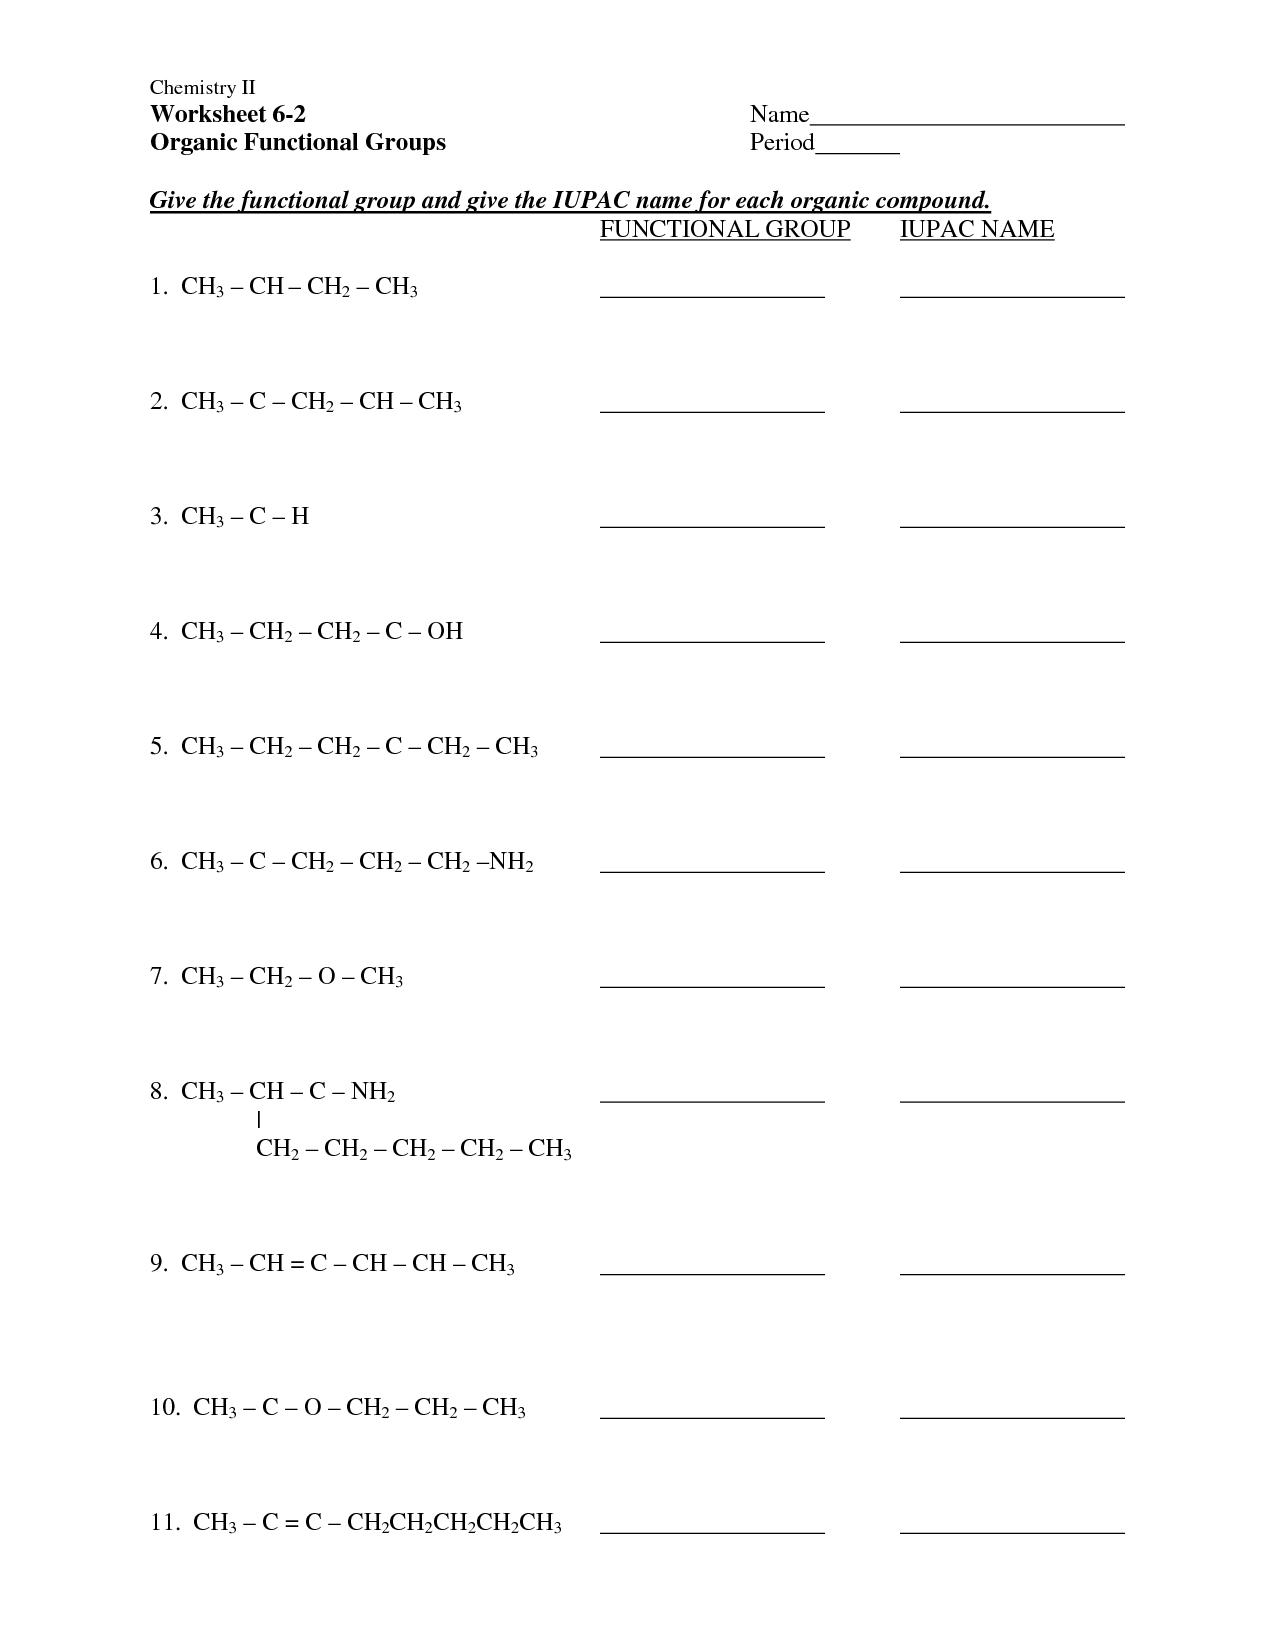 Organic Functional Groups Worksheet Answers